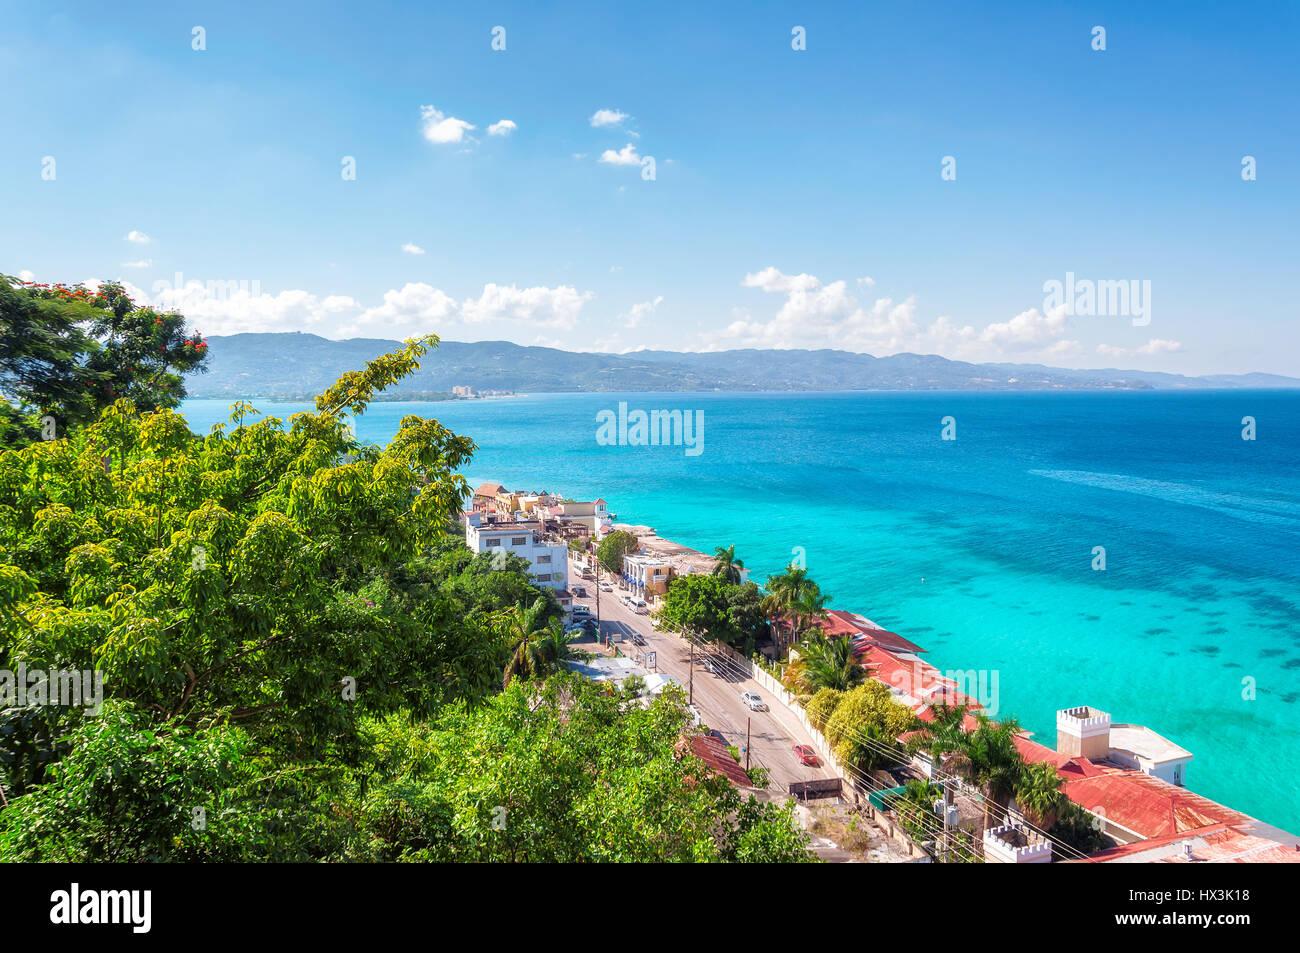 Jamaica island, Montego Bay. - Stock Image